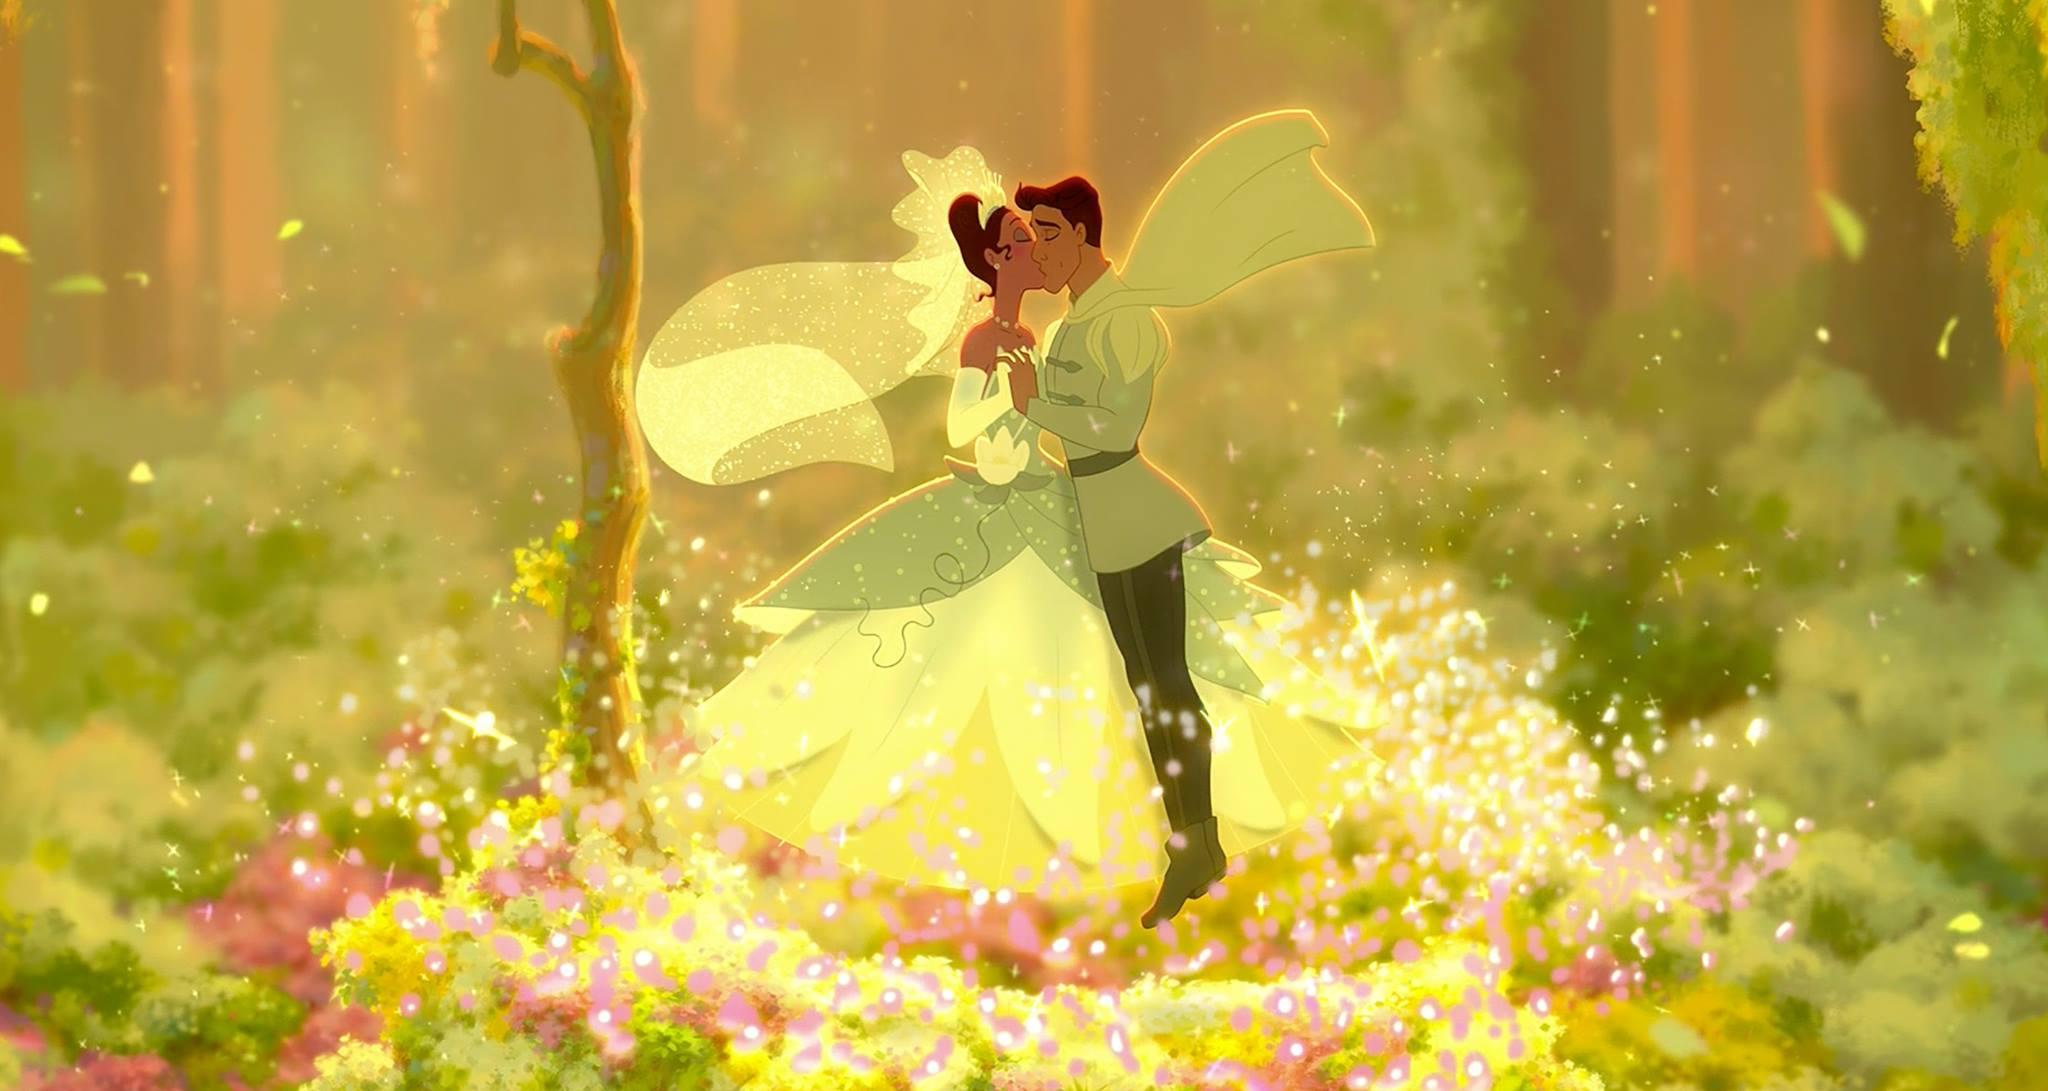 Tiana and Naveen - Disney Princess Photo (36955443) - Fanpop